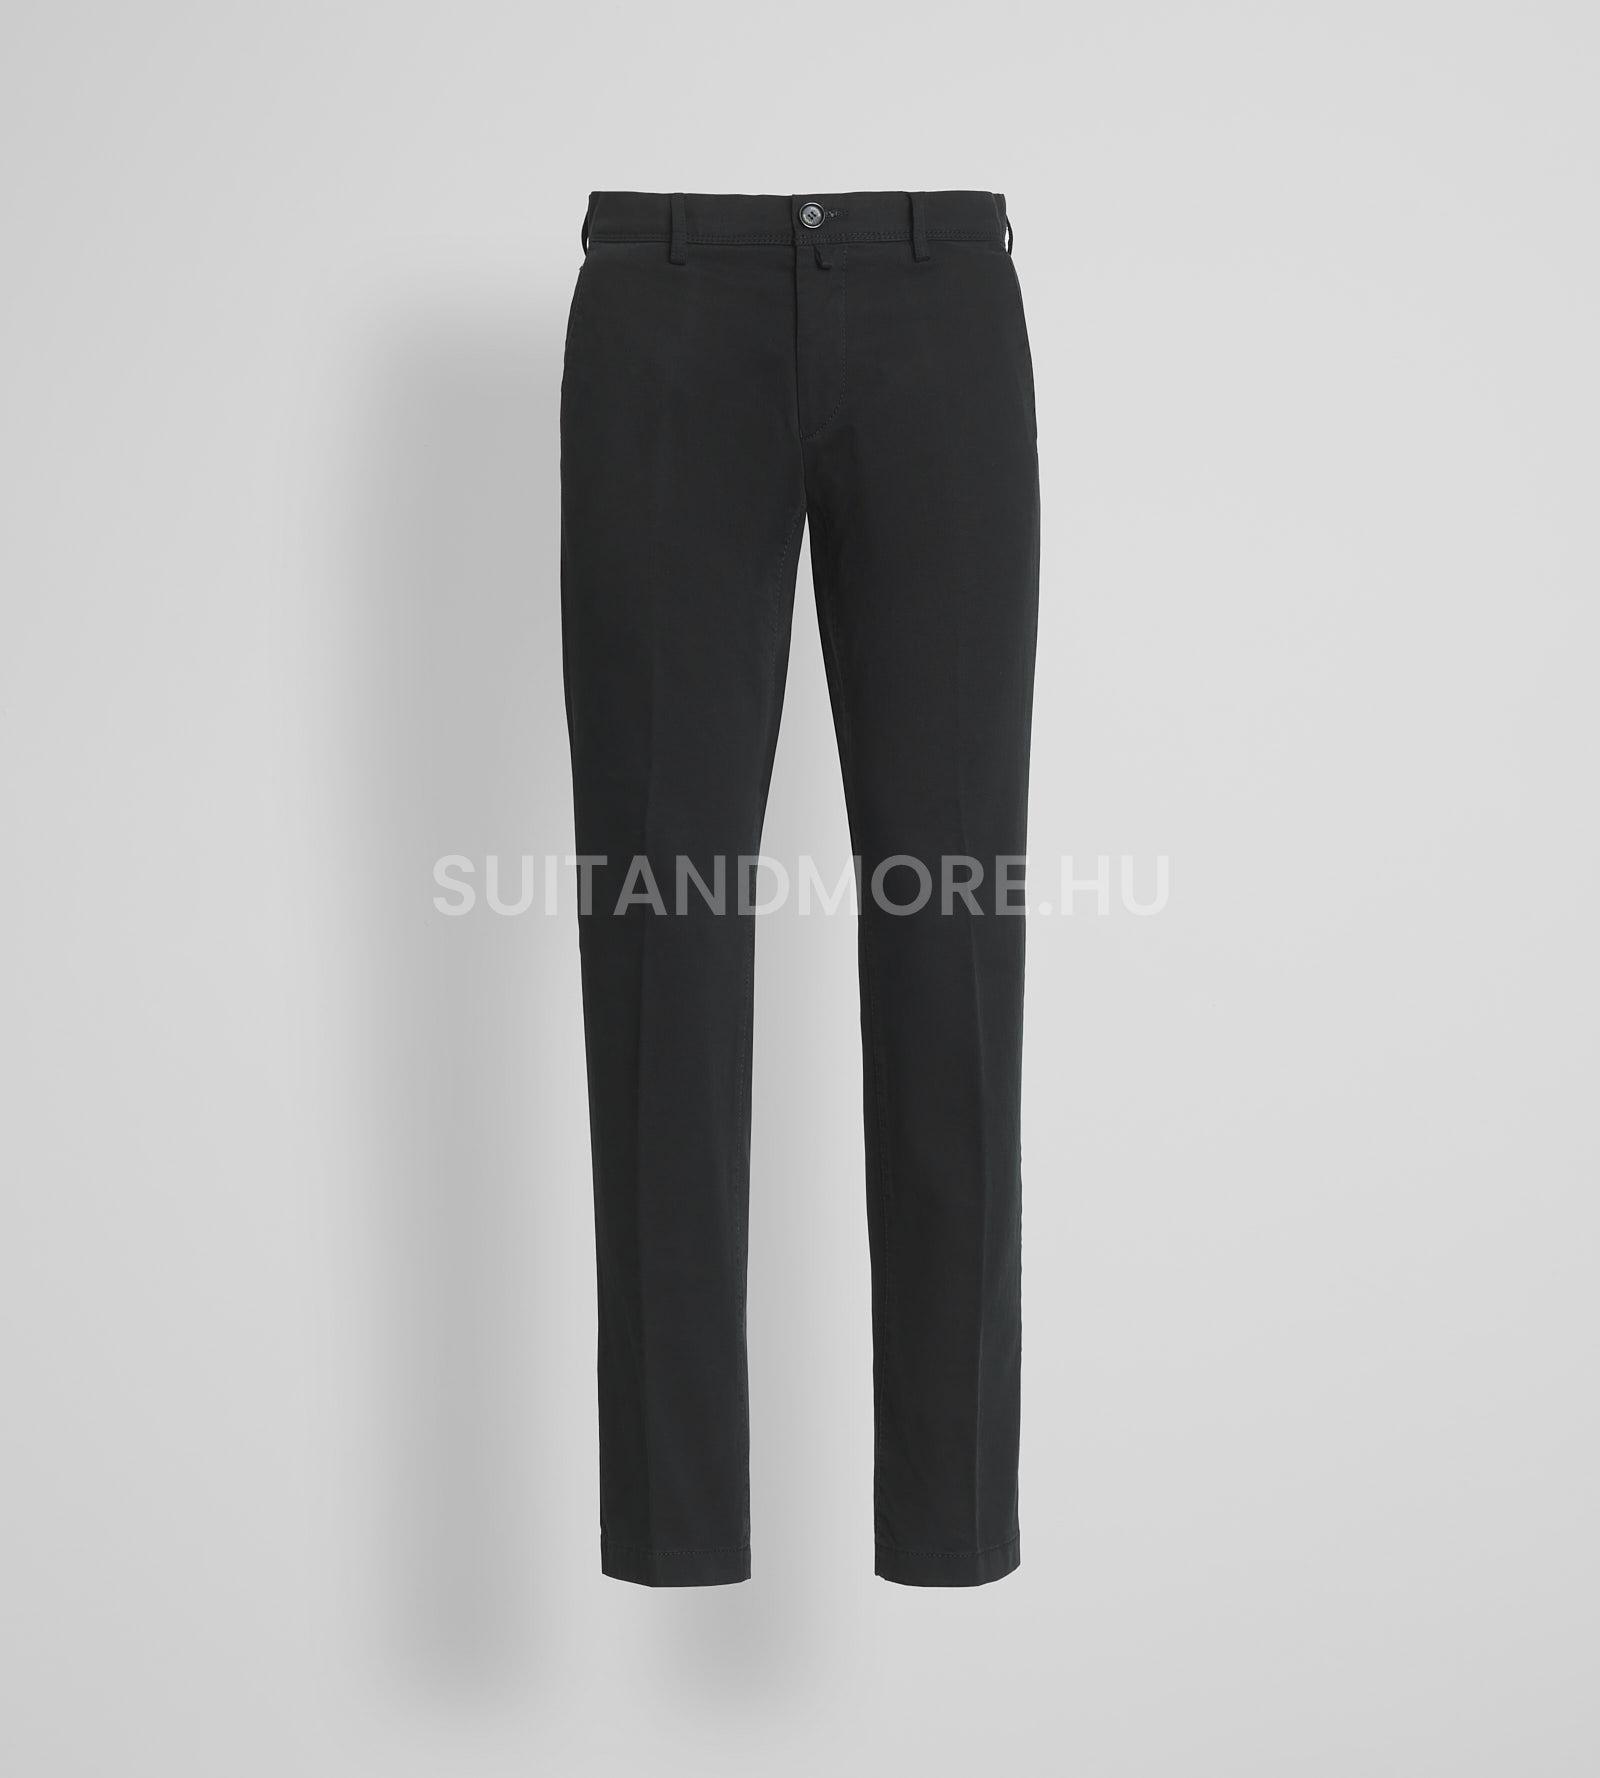 DIGEL-fekete-slim-fit-pamut-sztreccs-chino-nadrág-ARLINGTON-88160-10-01